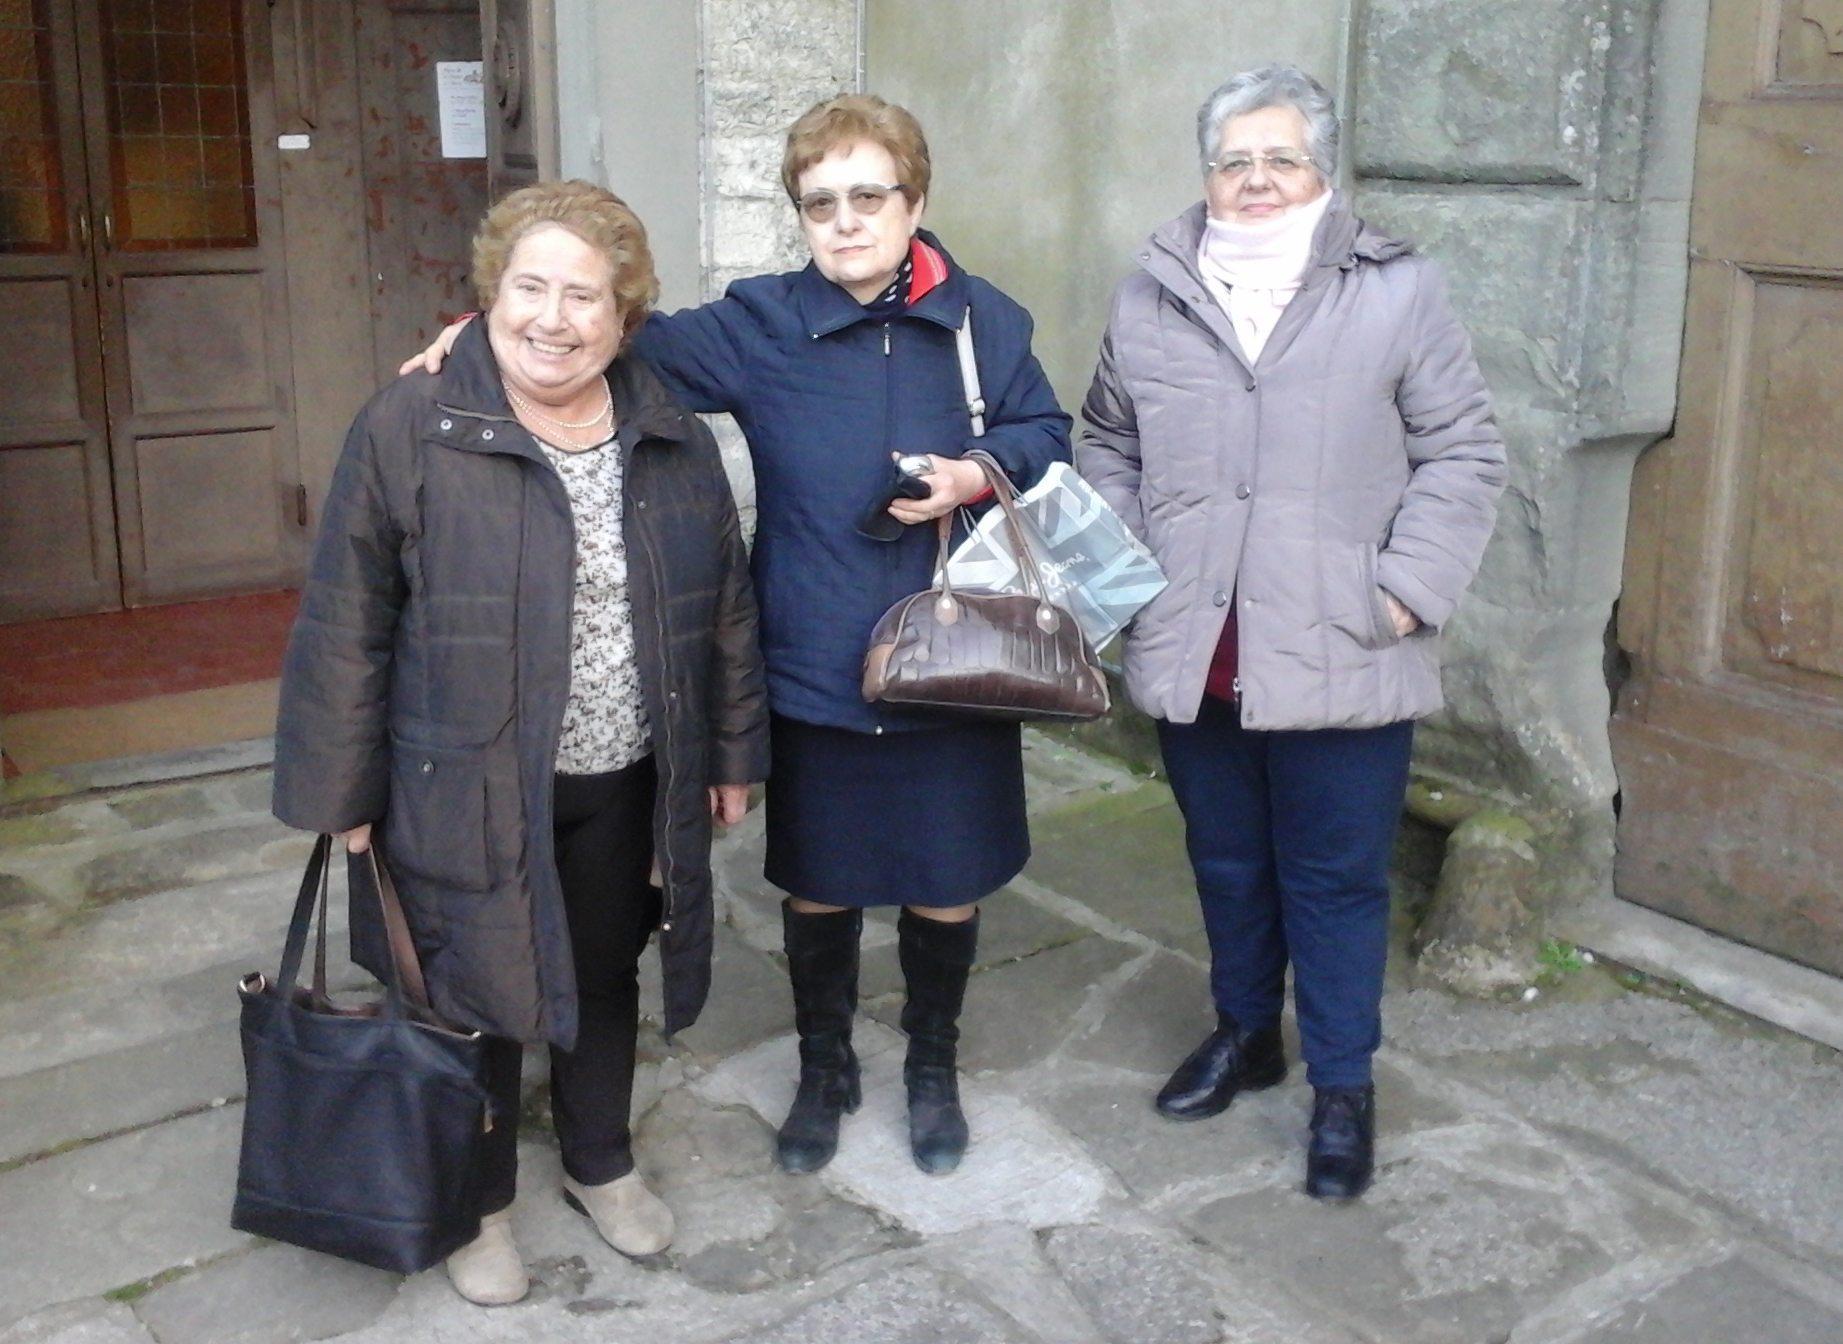 Mani di Donna. Da sinistra, Maria Teresa Berna, Cesarina Biagioni e Sandra Mirannalti.